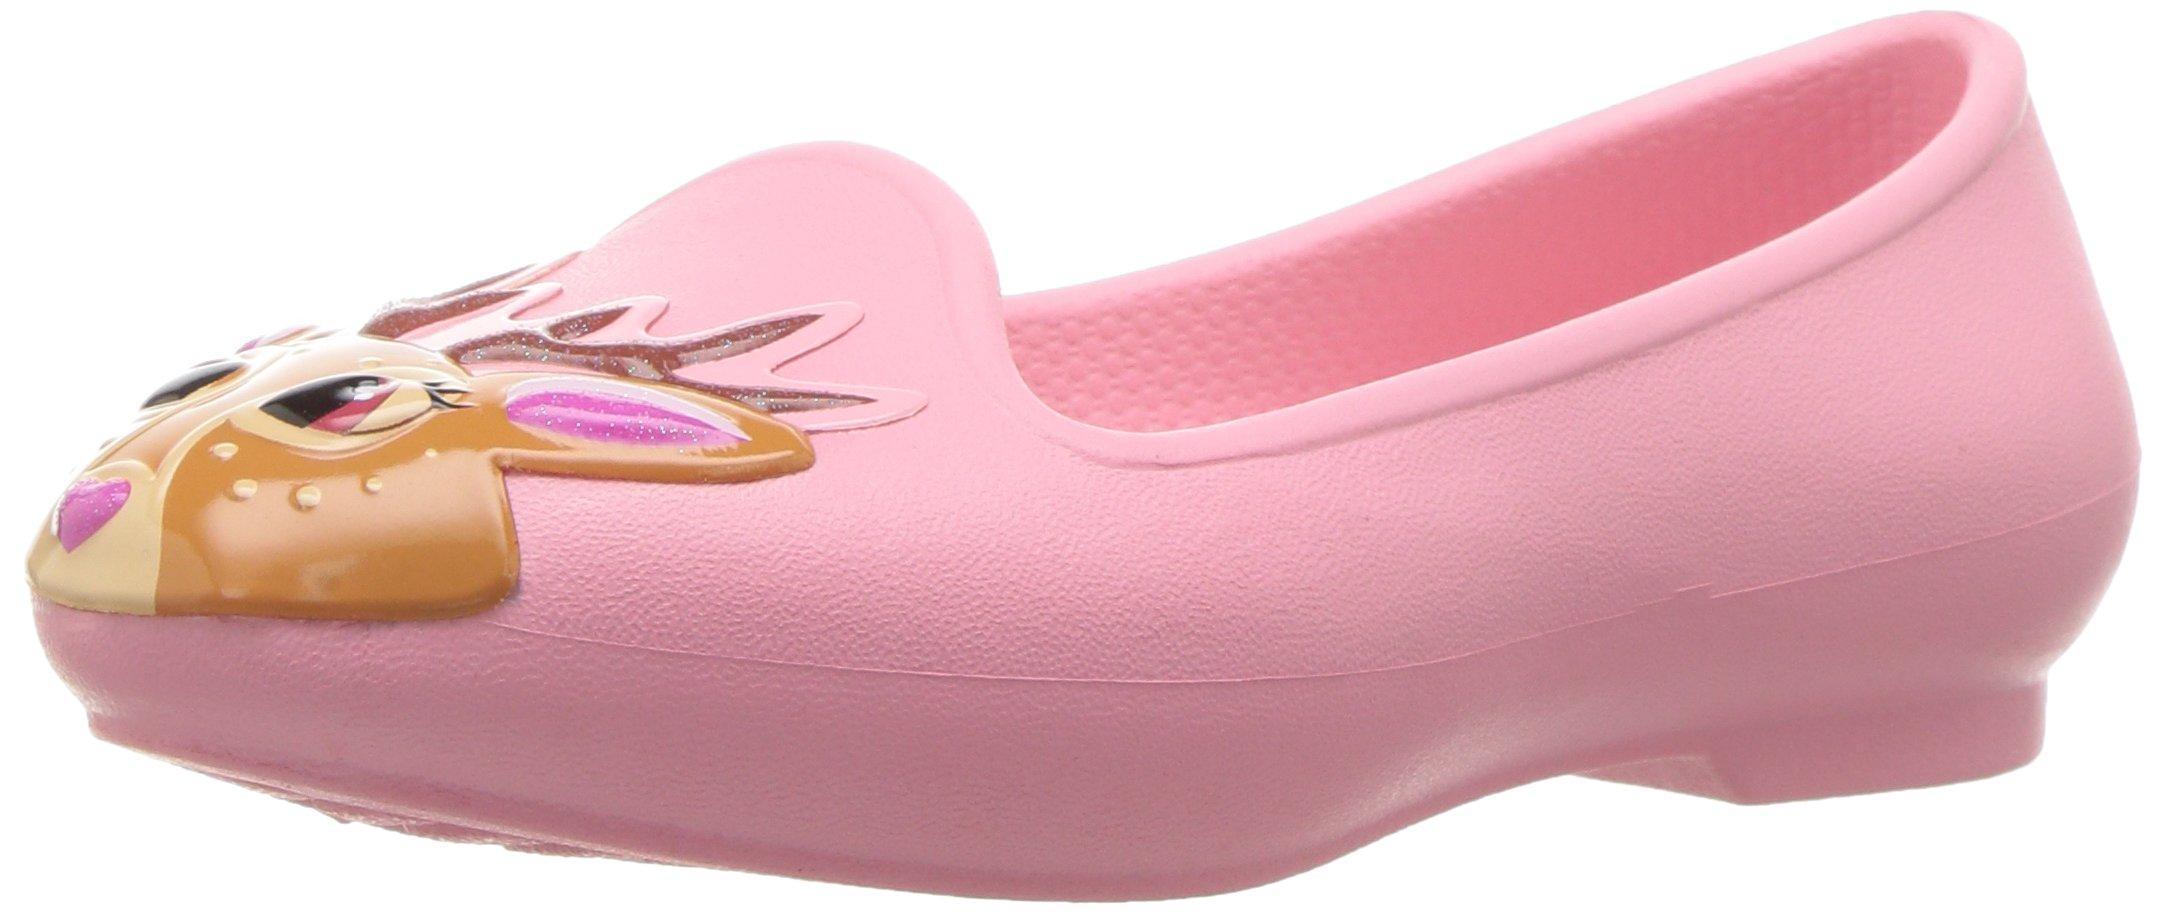 Crocs Girls' Eve Novelty K Flat, Peony Pink, 9 M US Toddler